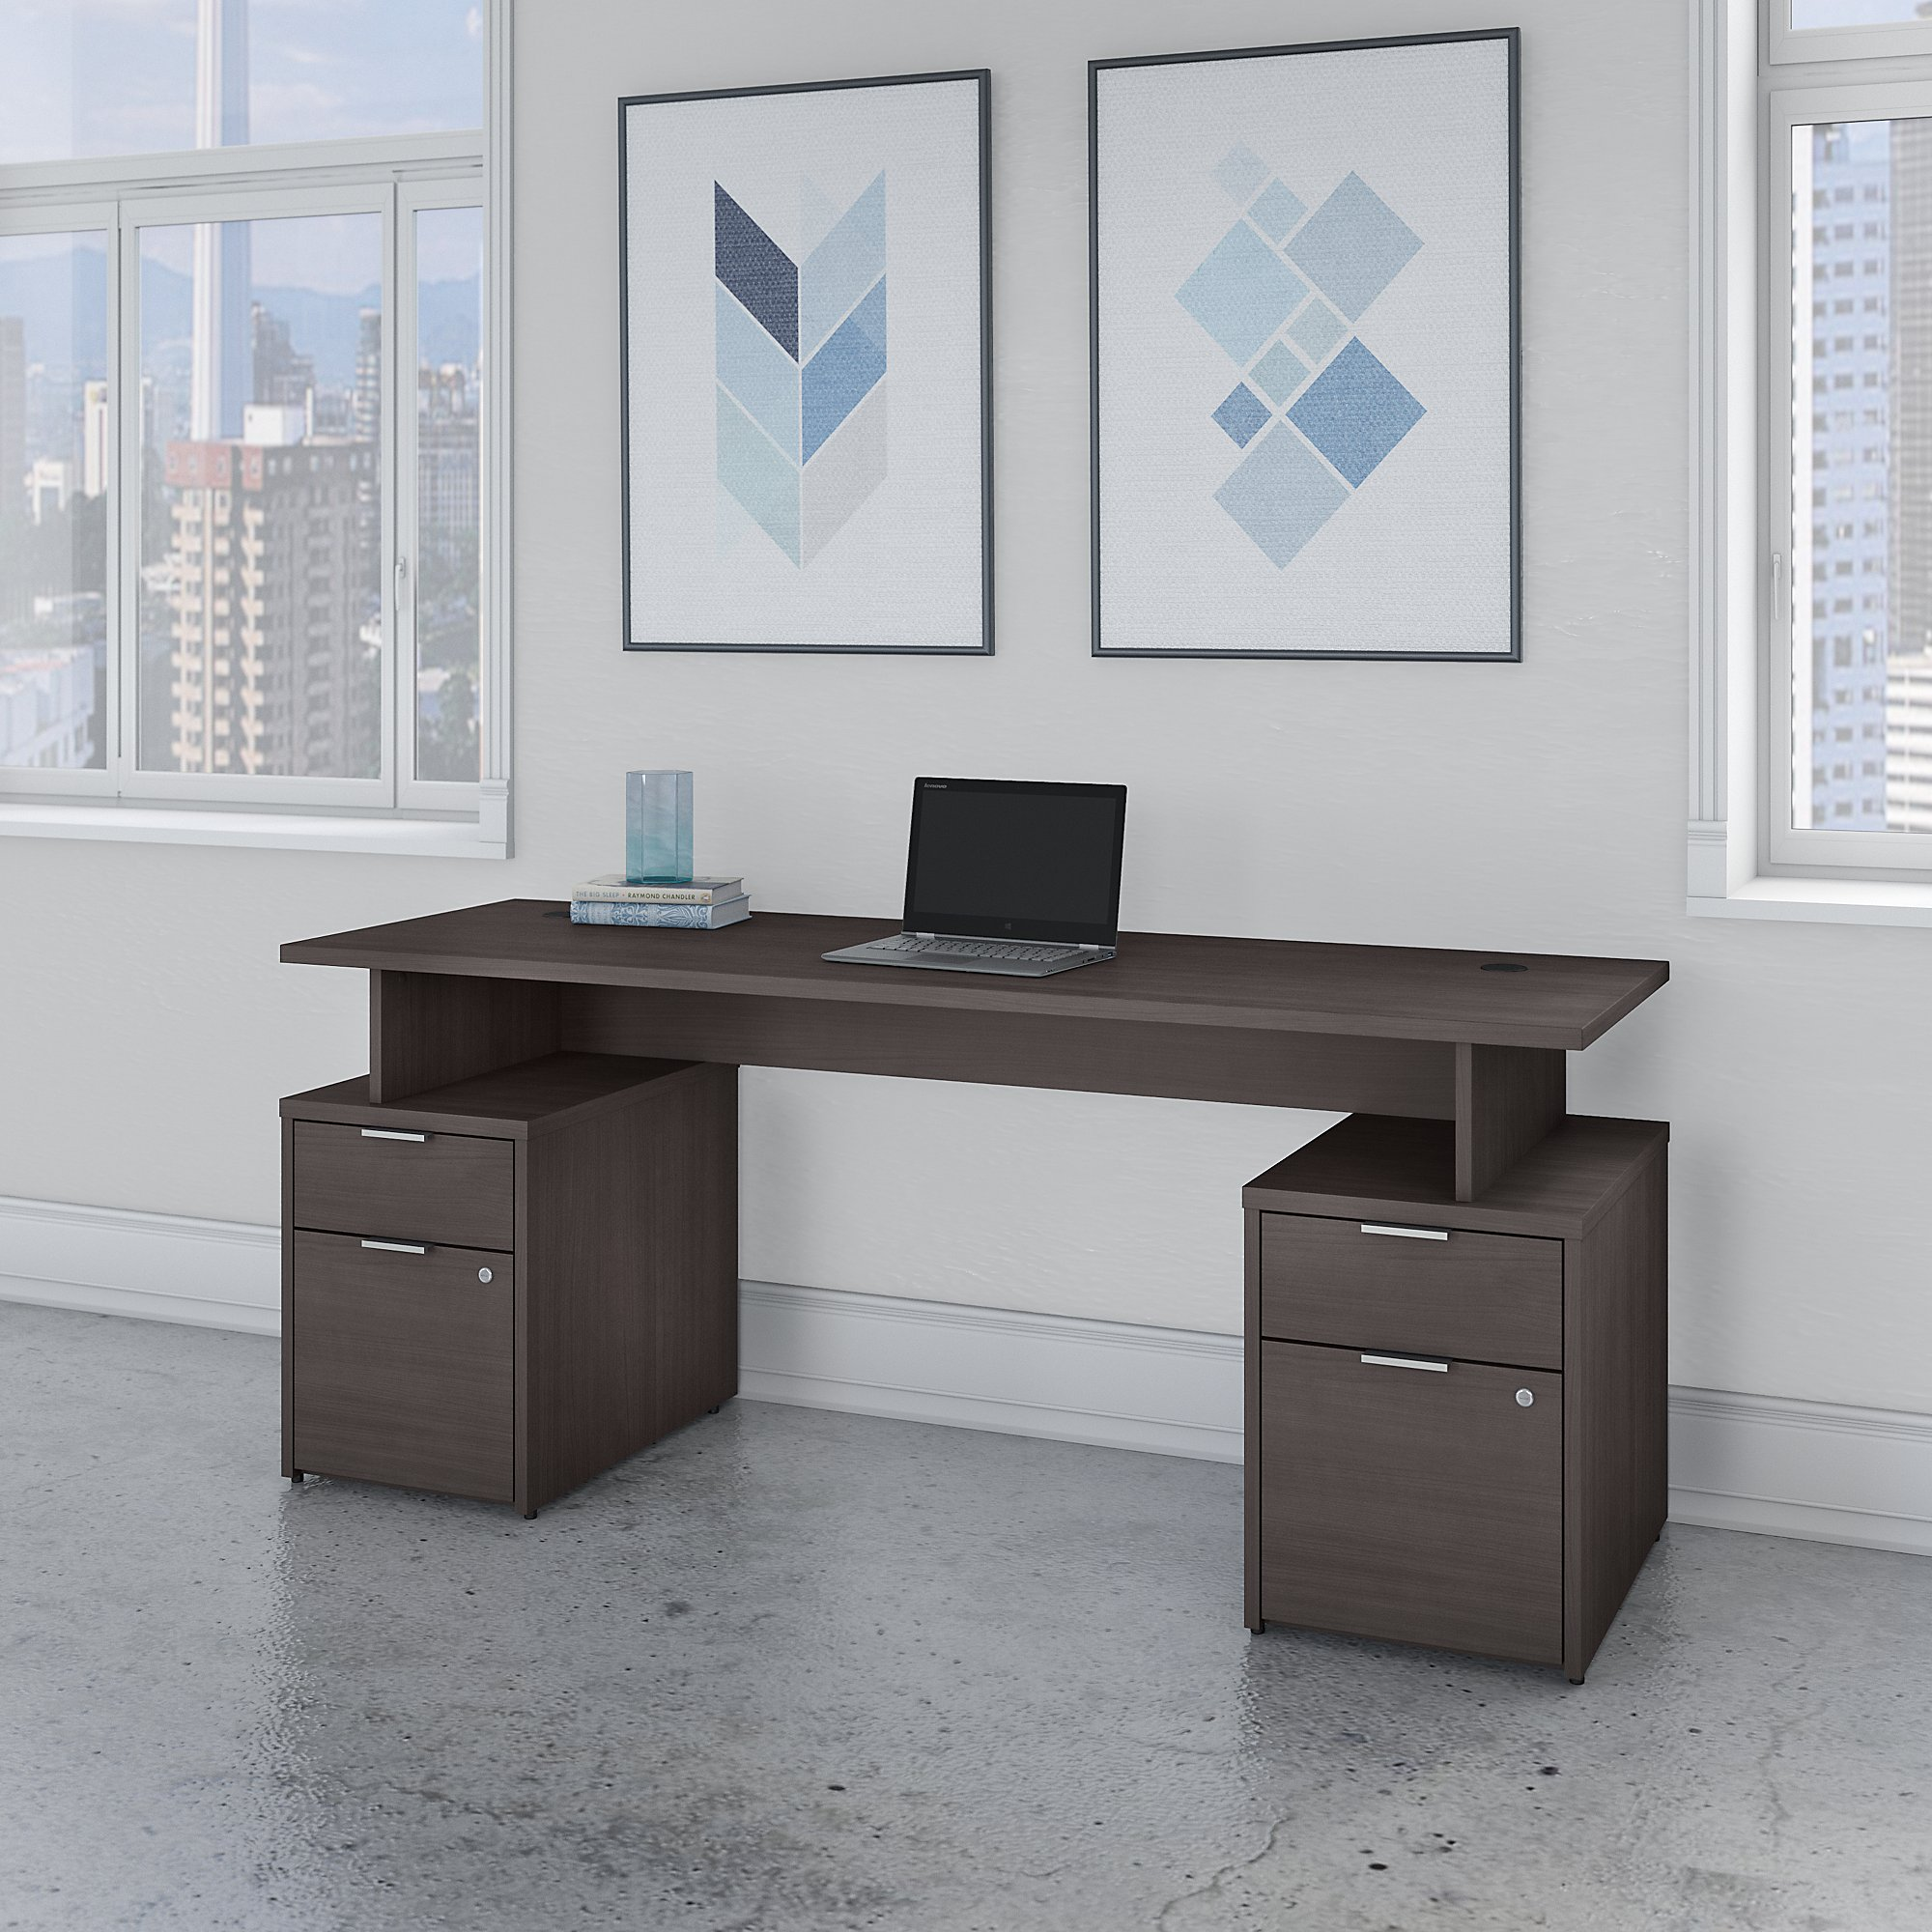 jtn005 storm gray jamestown desk